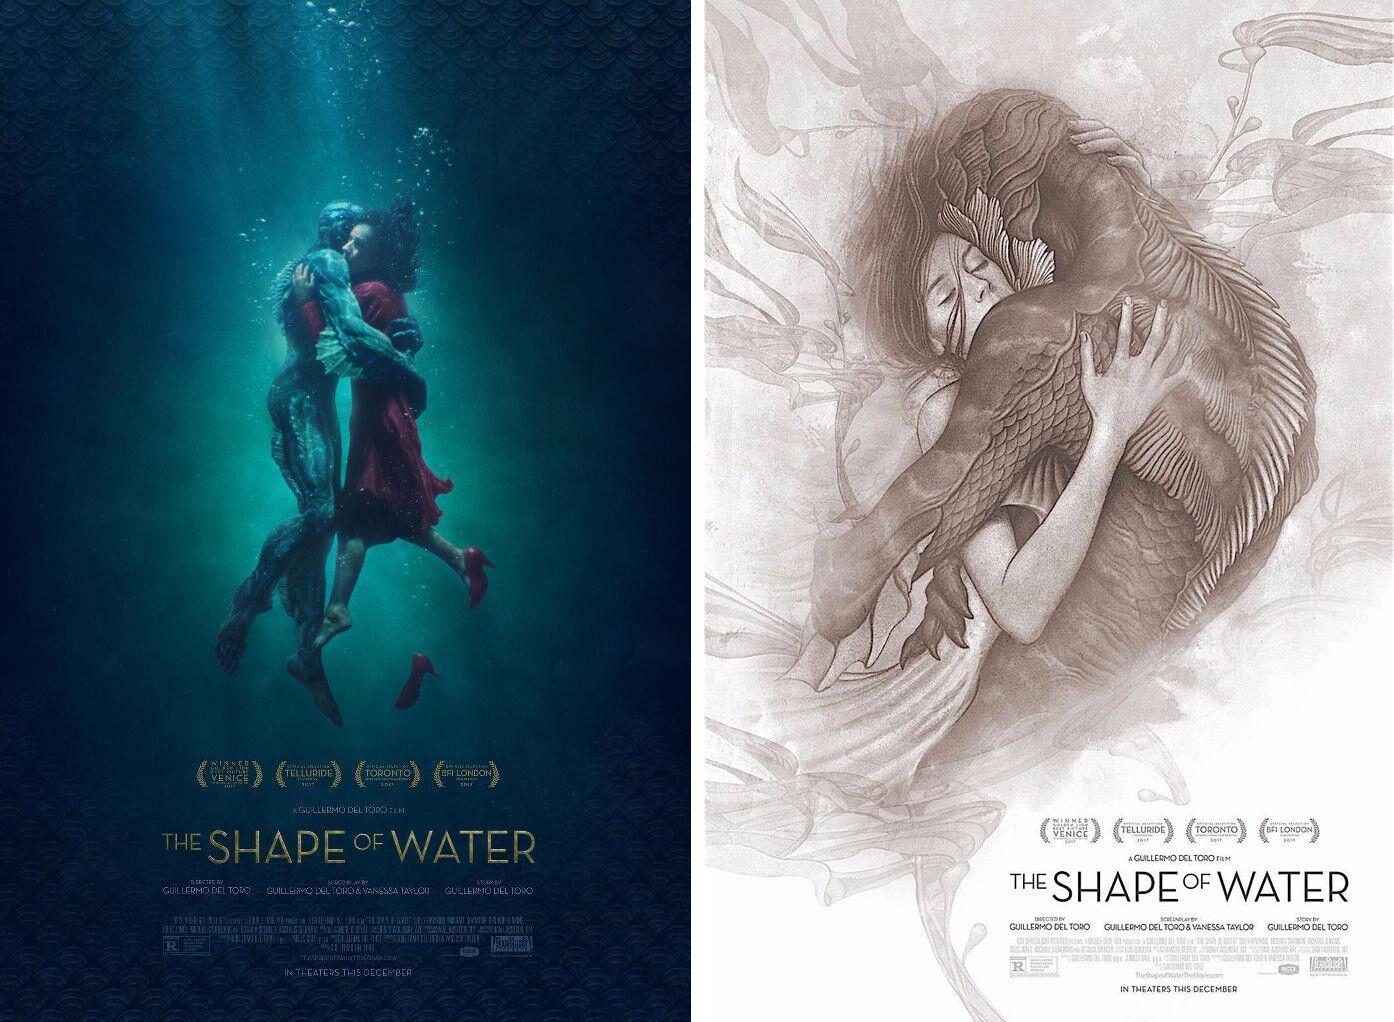 Купить The Shape of Water (2017) ***Original Movie Poster Set of 2 / Size: 13.5x20